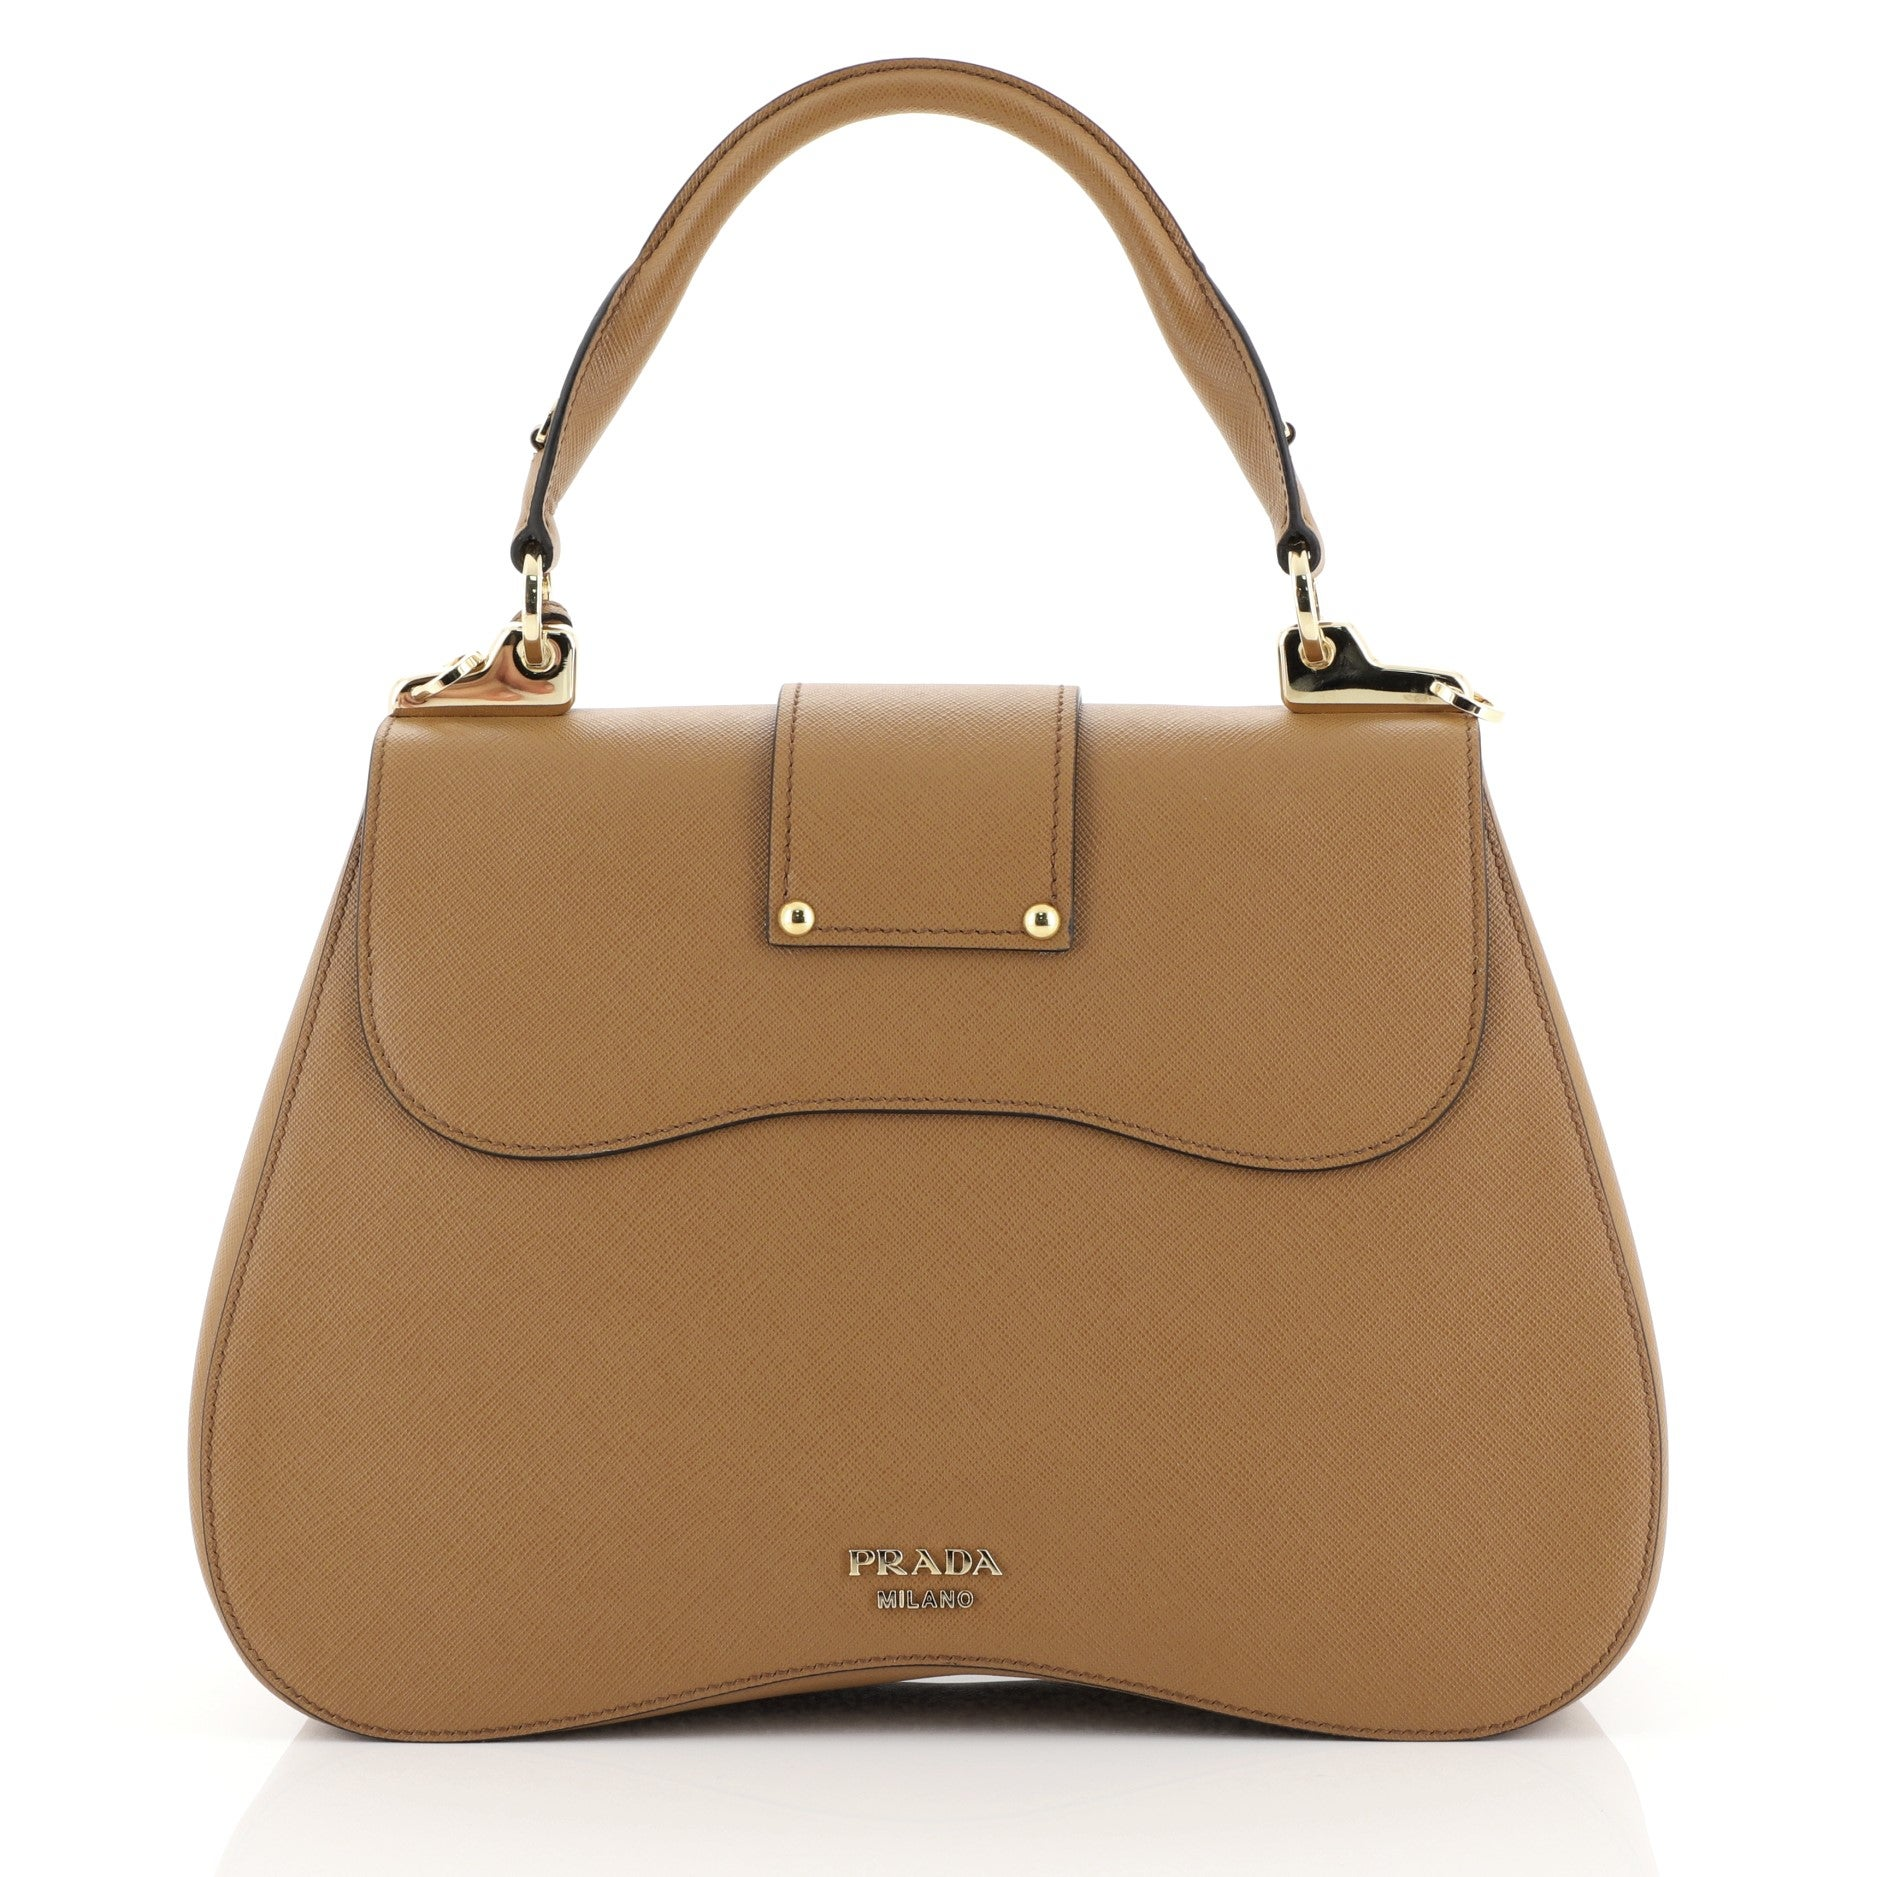 5e85ae0bf8 Prada Sidonie Top Handle Bag Saffiano Leather Large